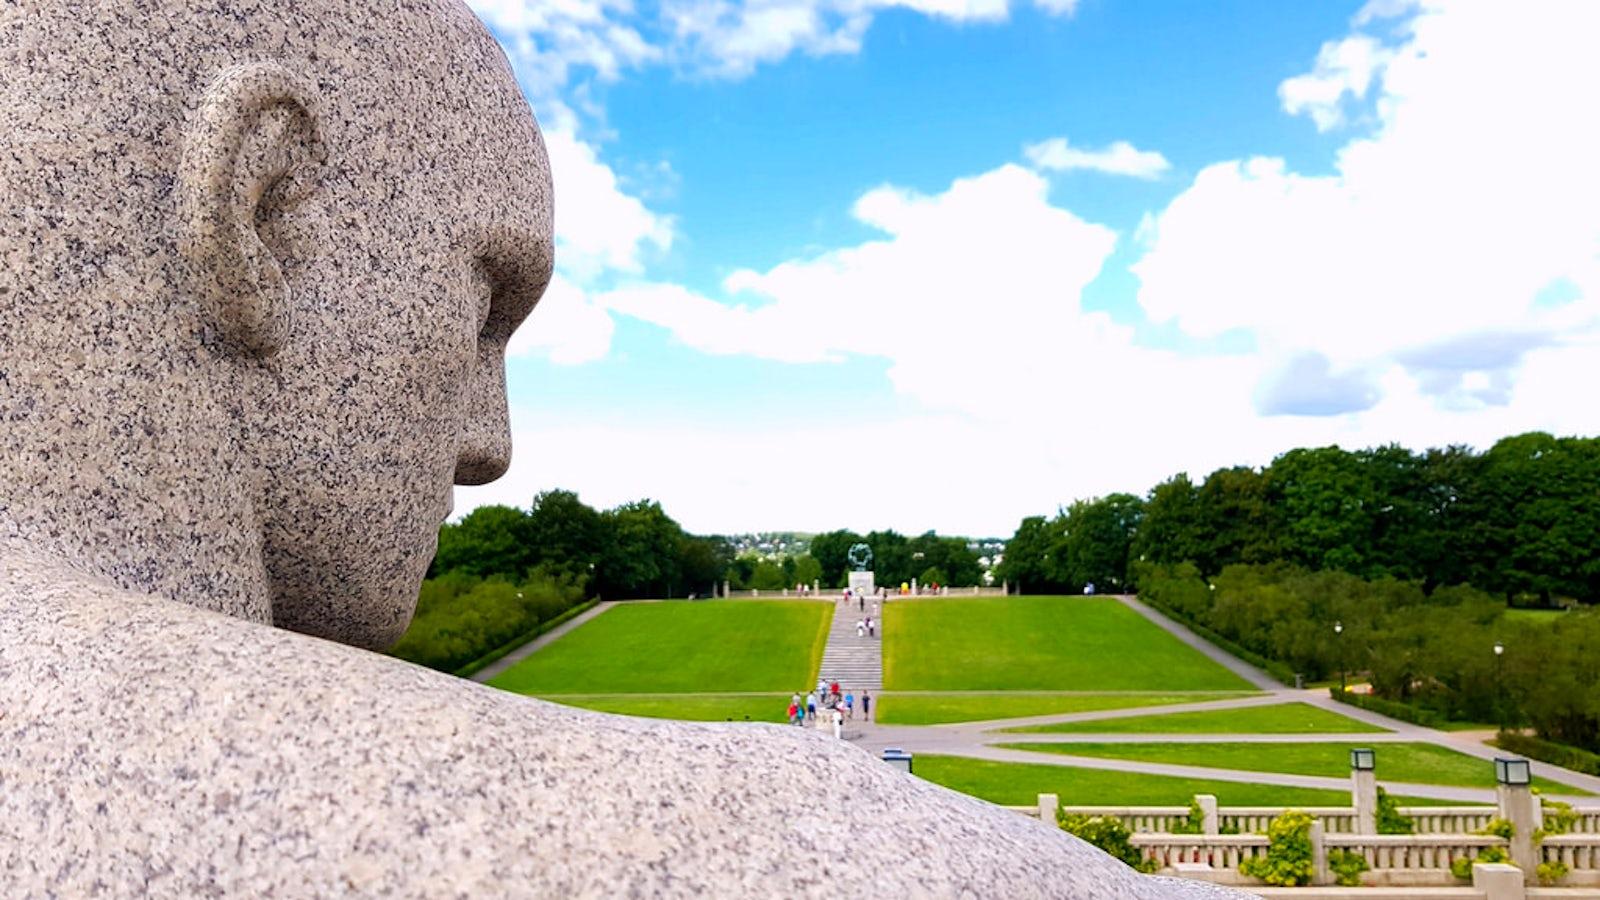 © Photo: Tu - Sculpture in the park